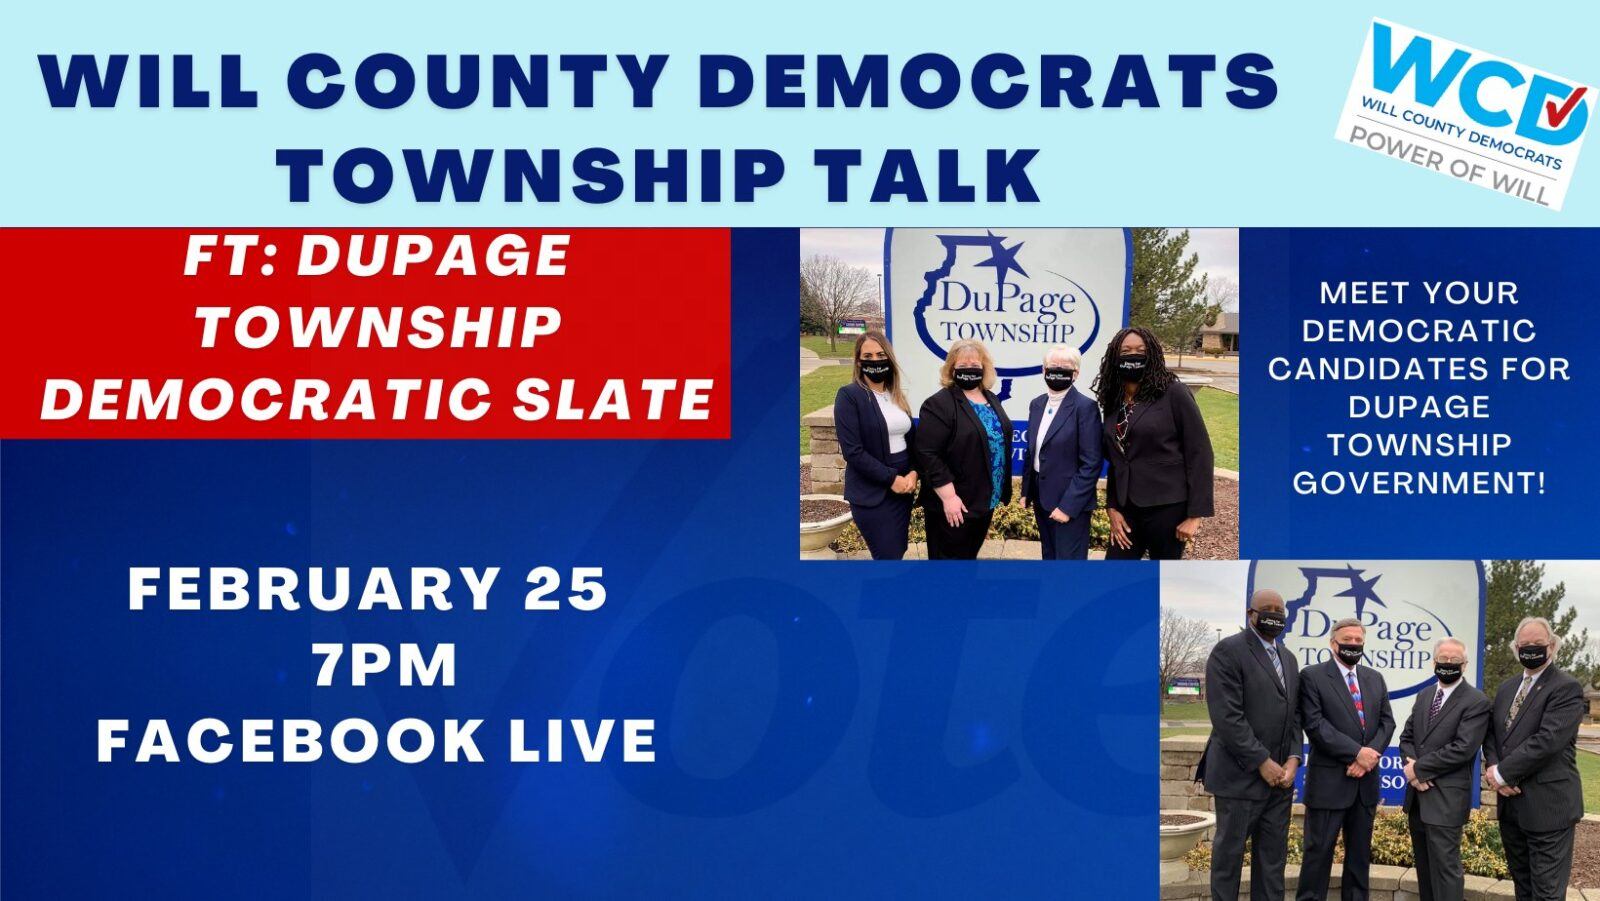 Township Talk: DuPage